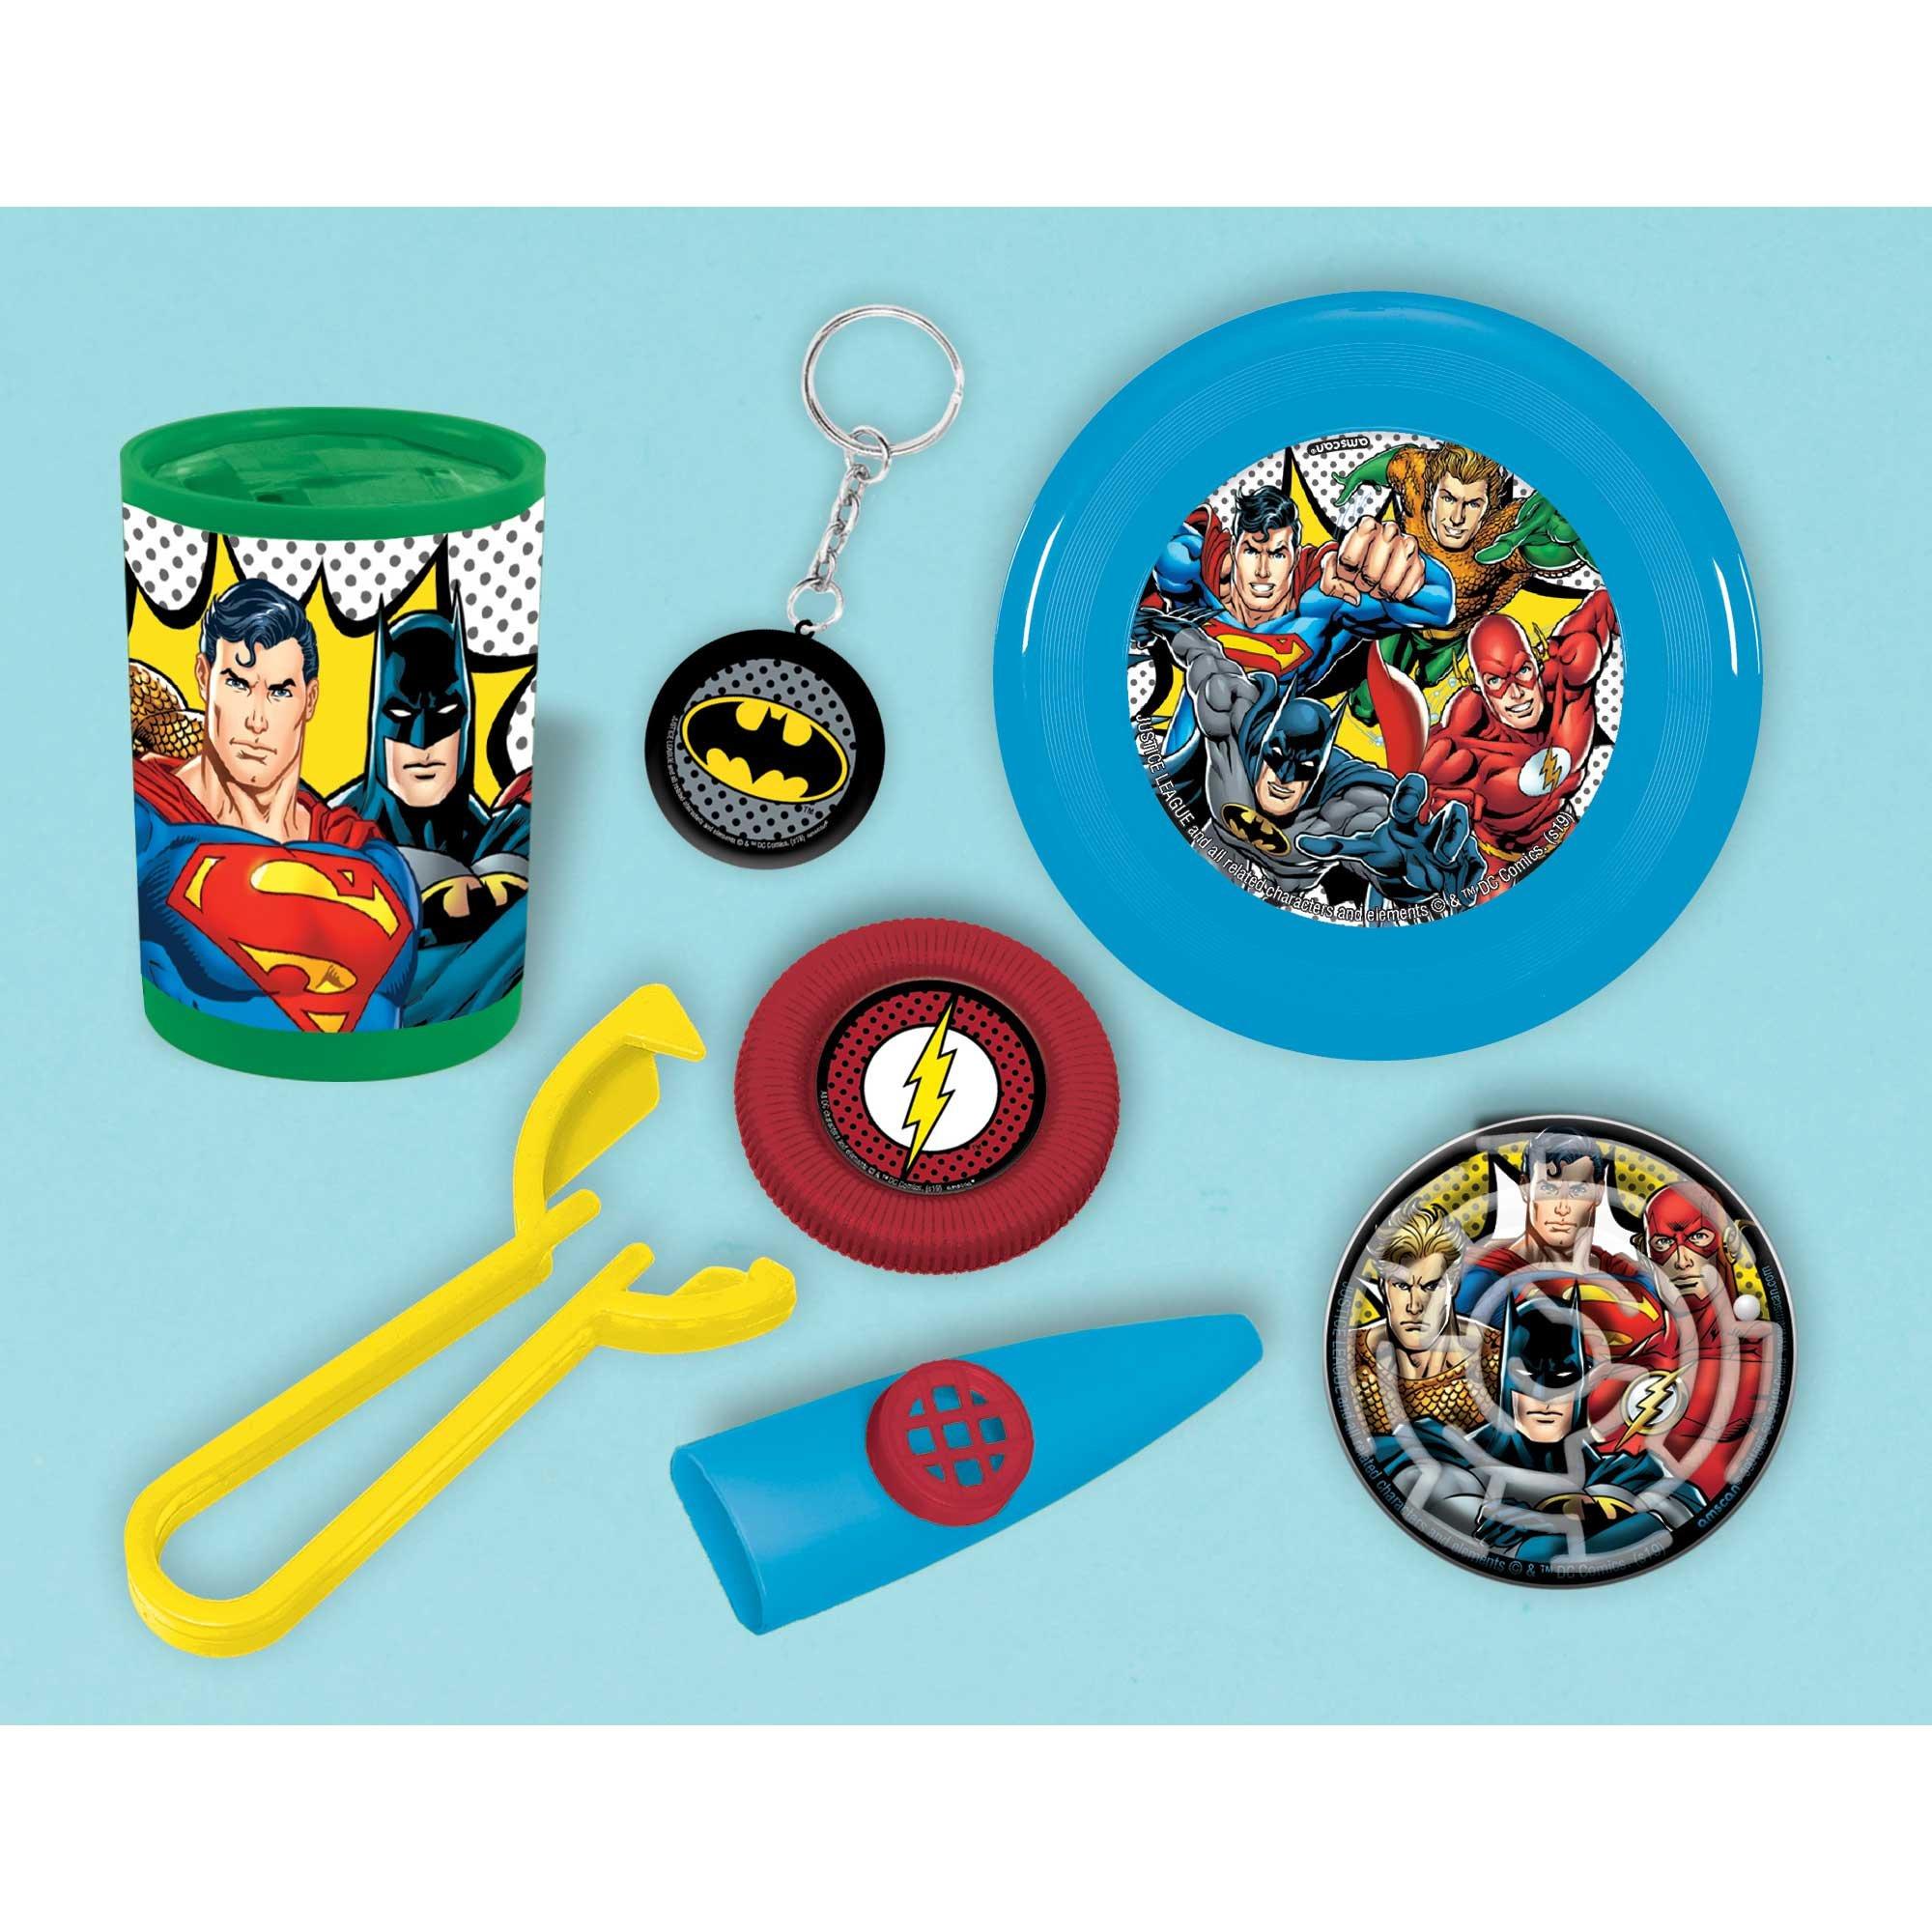 Justice League Heroes Unite Mega Mix Favors Value Pack